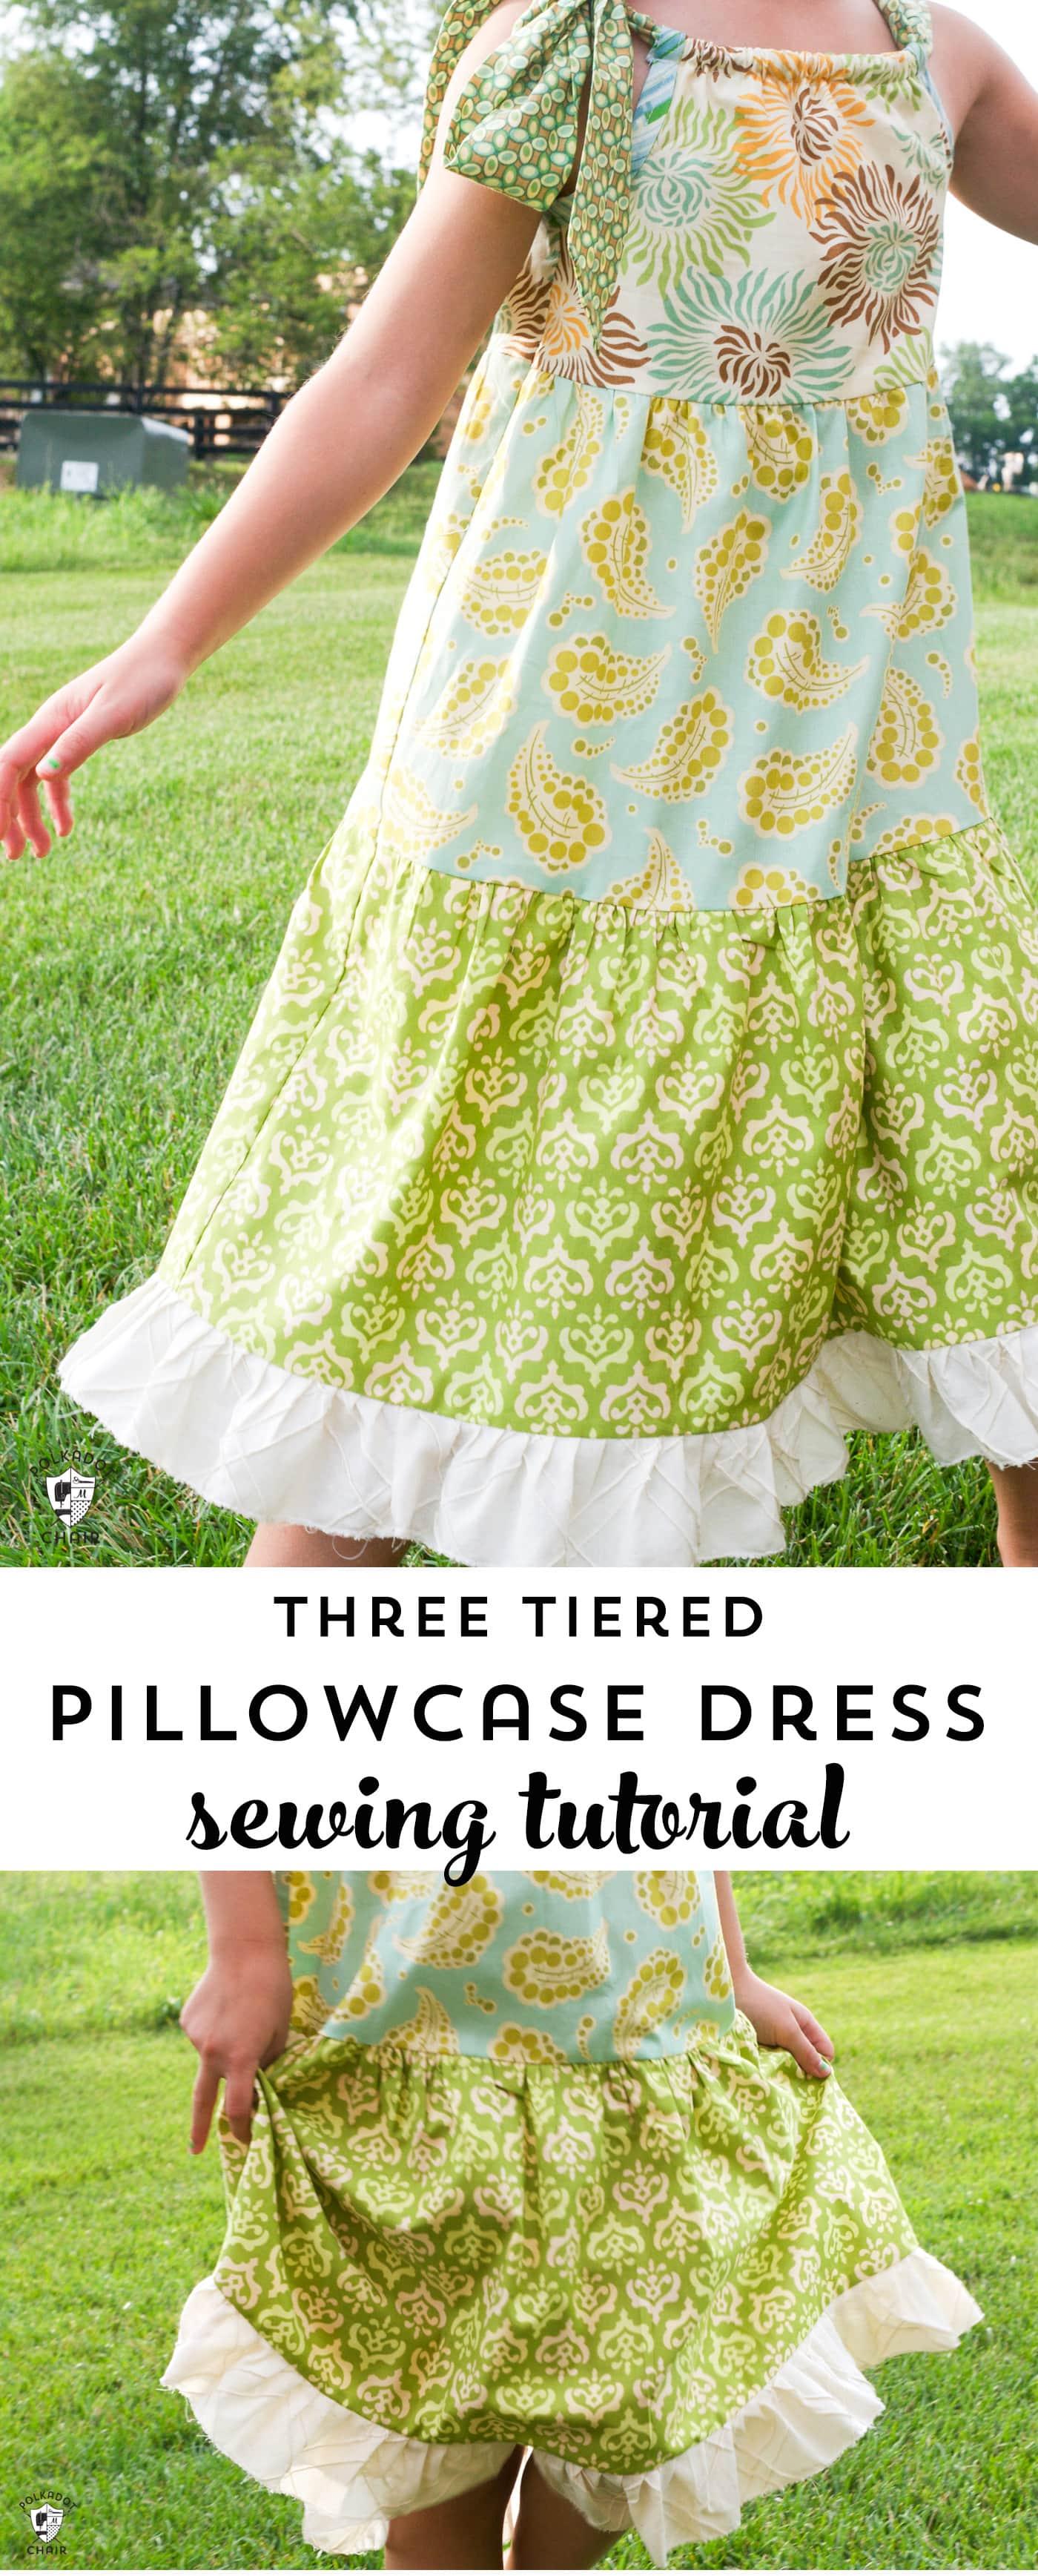 Tuesday Tutorial Tiered Pillowcase Dress  The Polkadot Chair